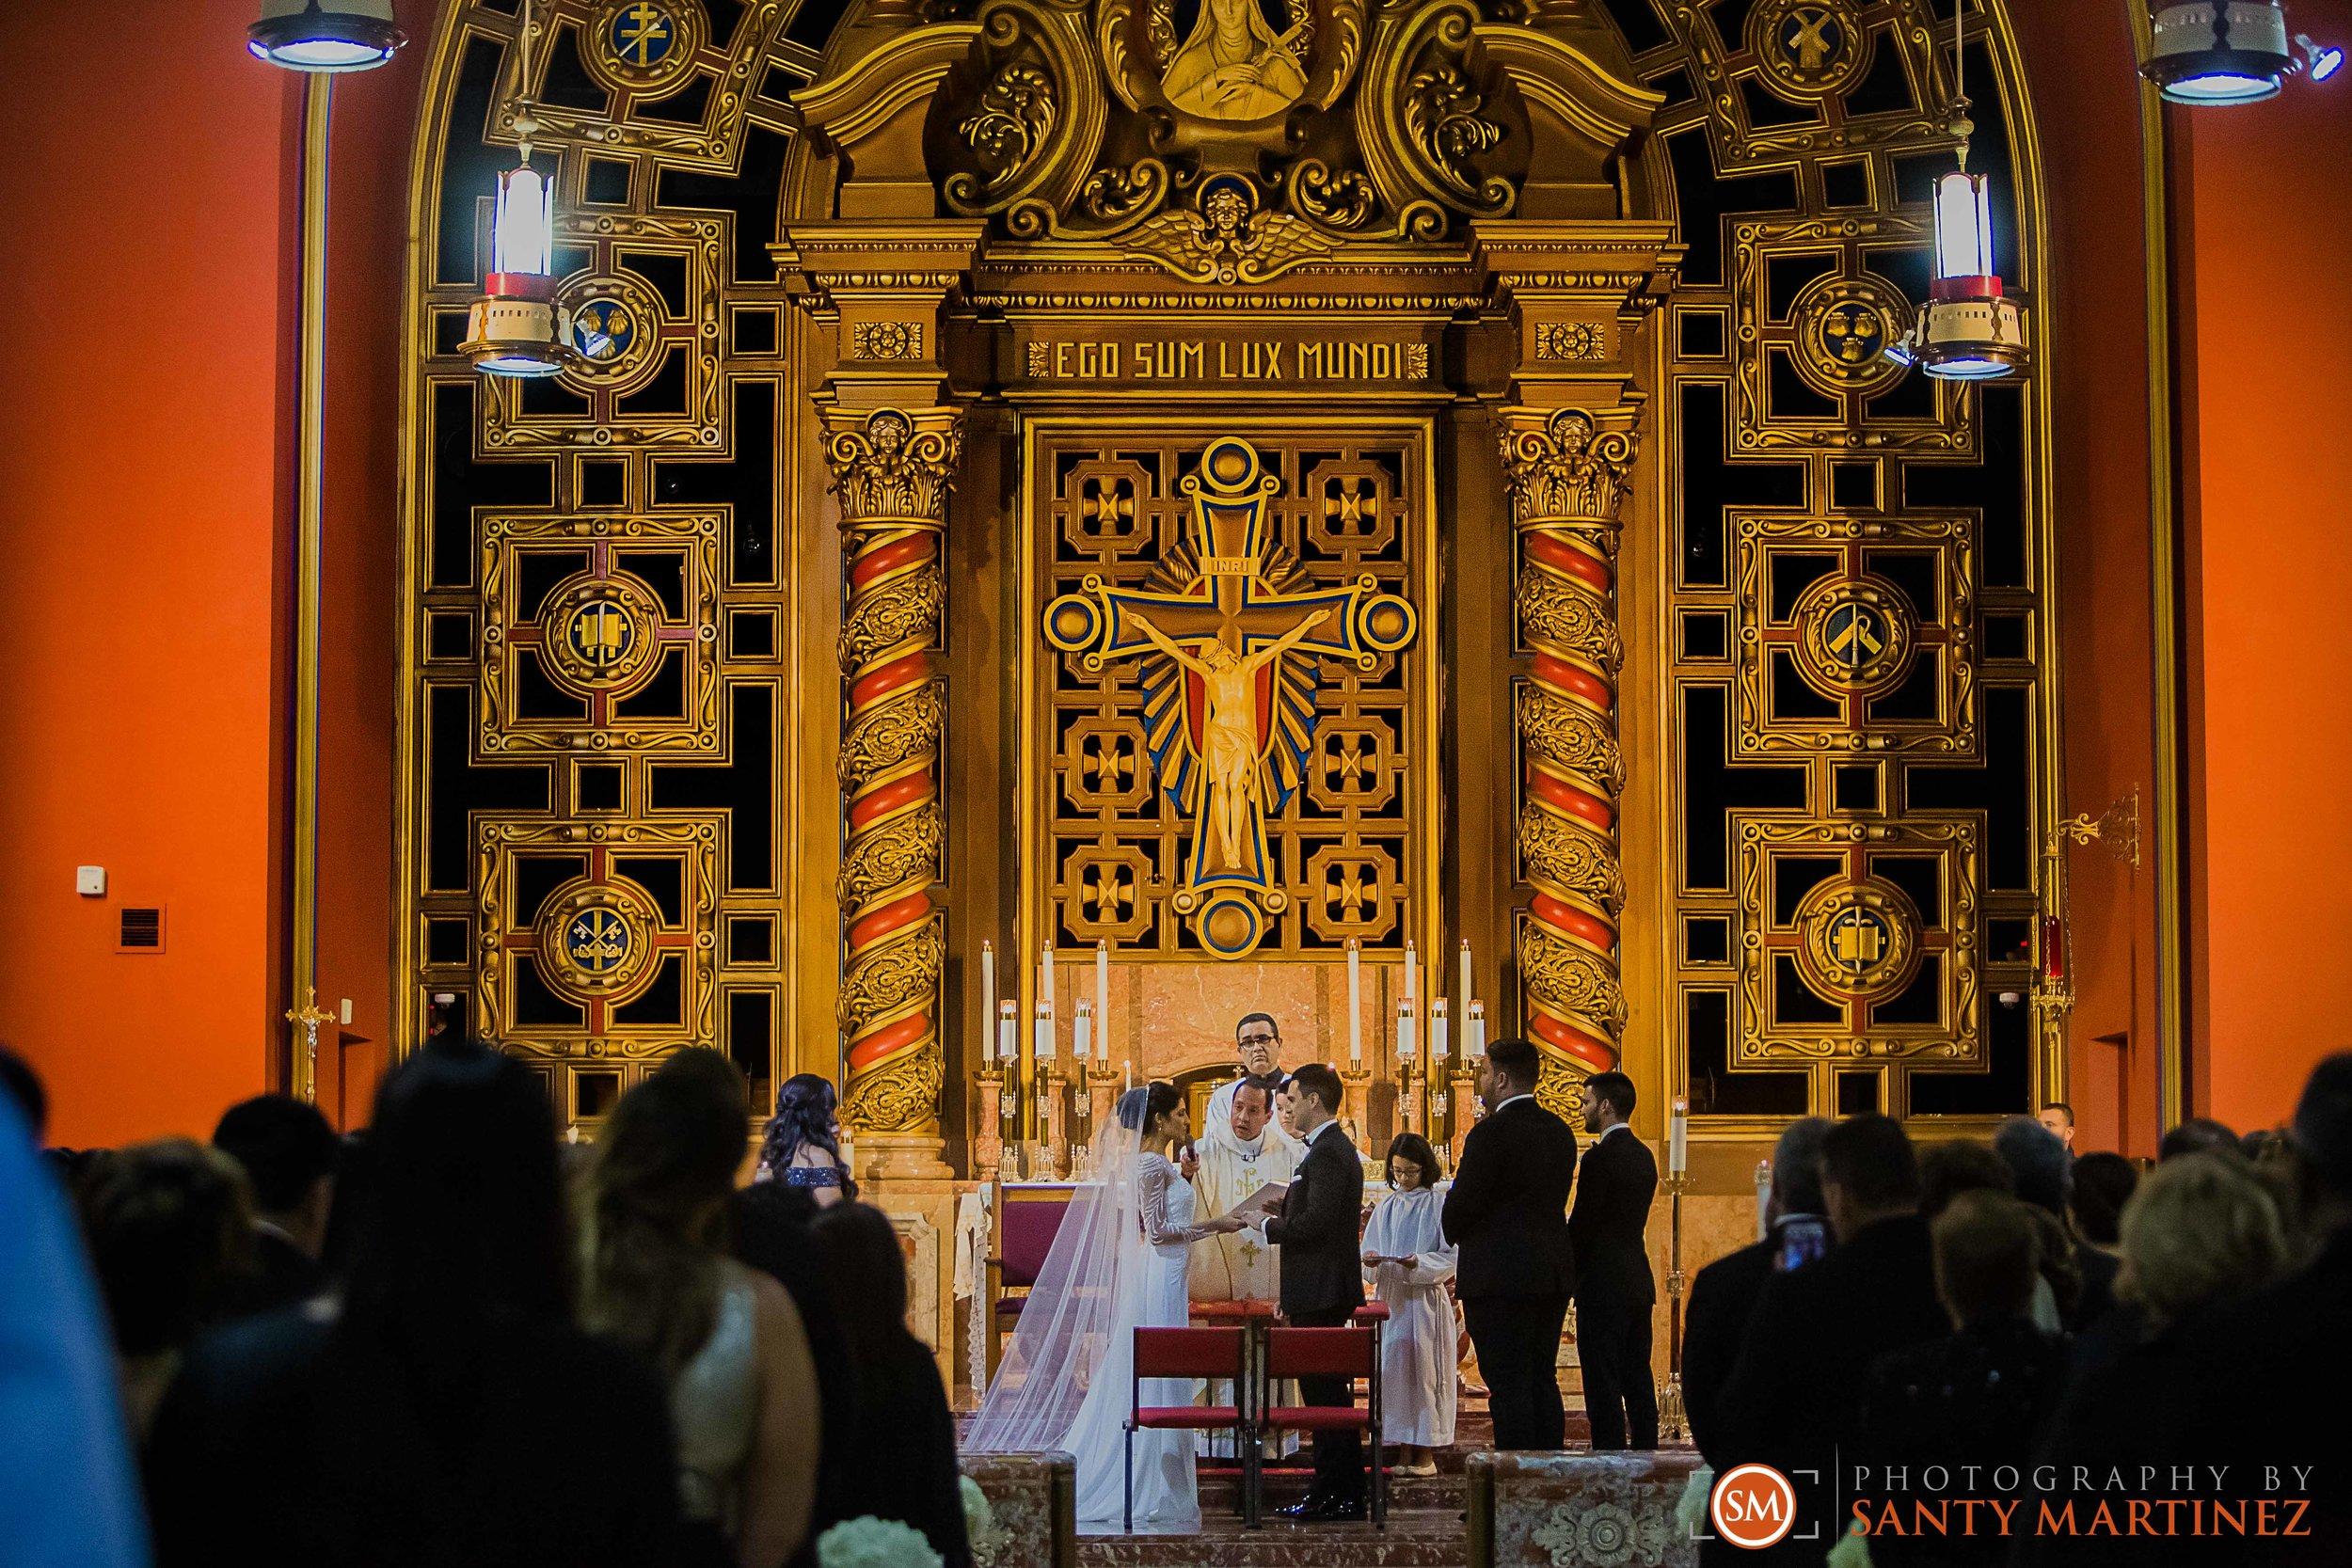 Wedding Trump National Doral Miami - Photography by Santy Martinez-14.jpg